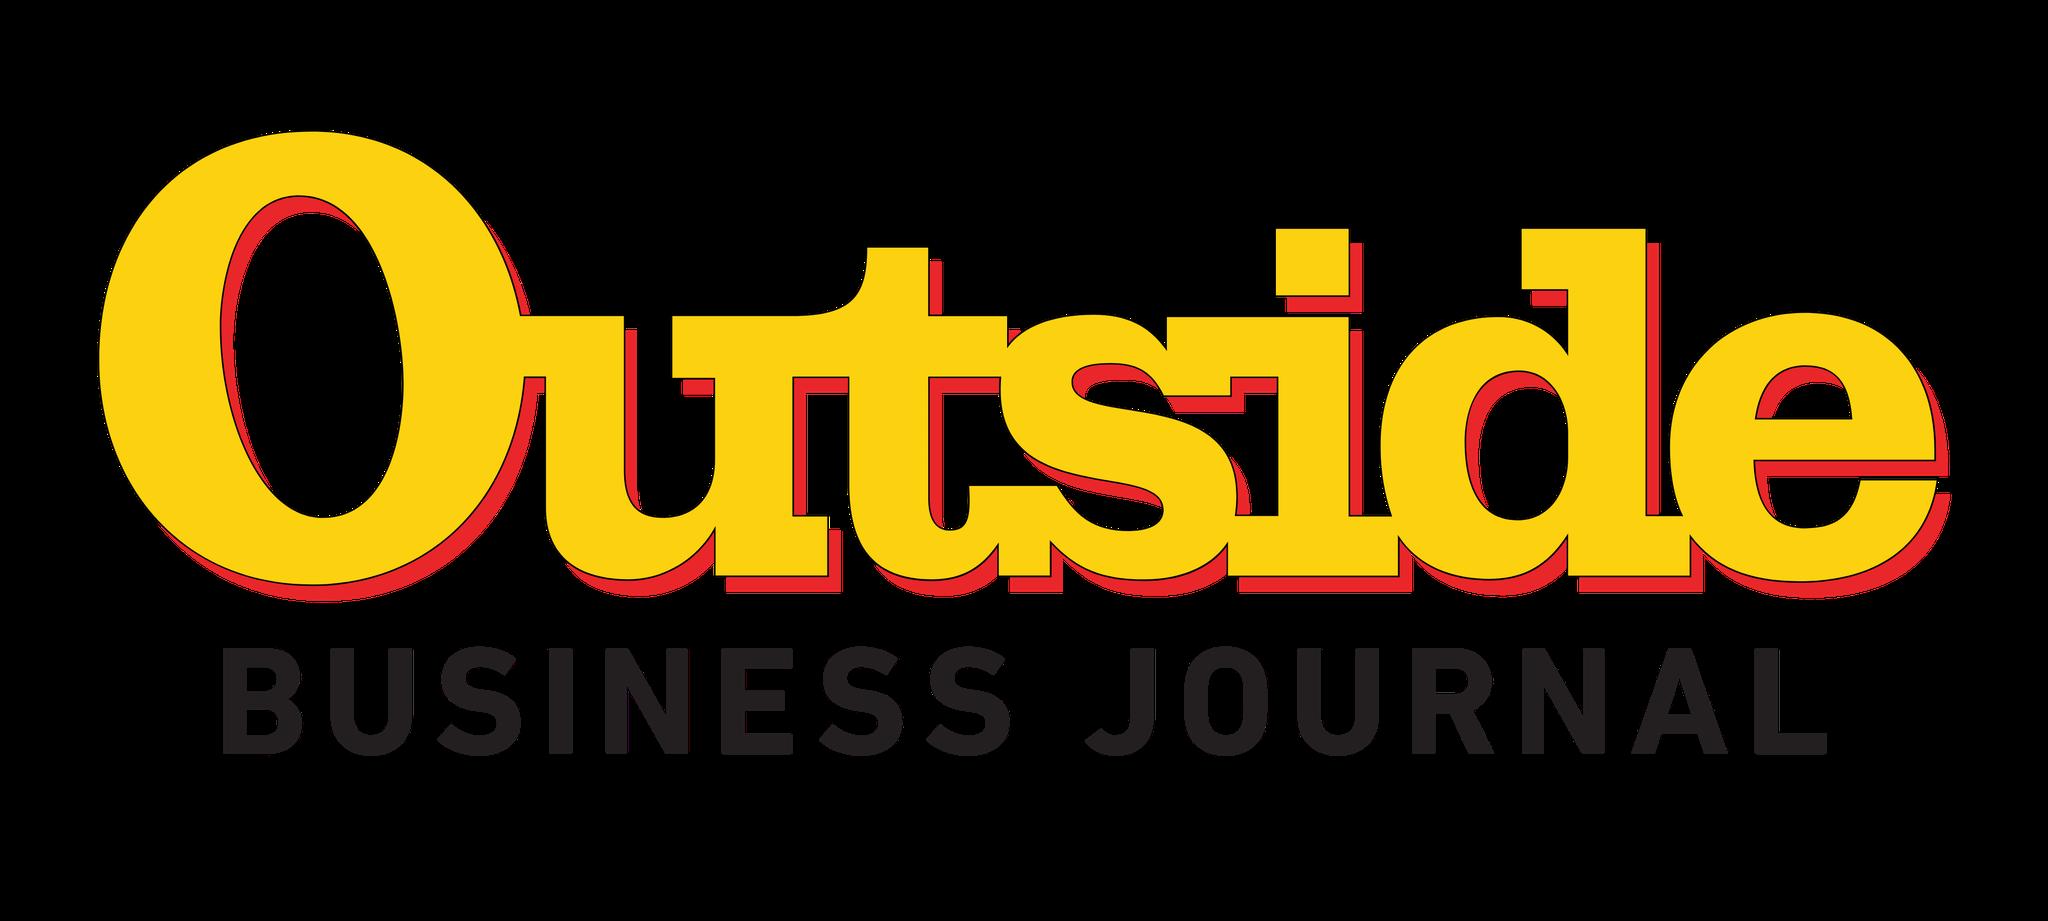 Outside Business Journal